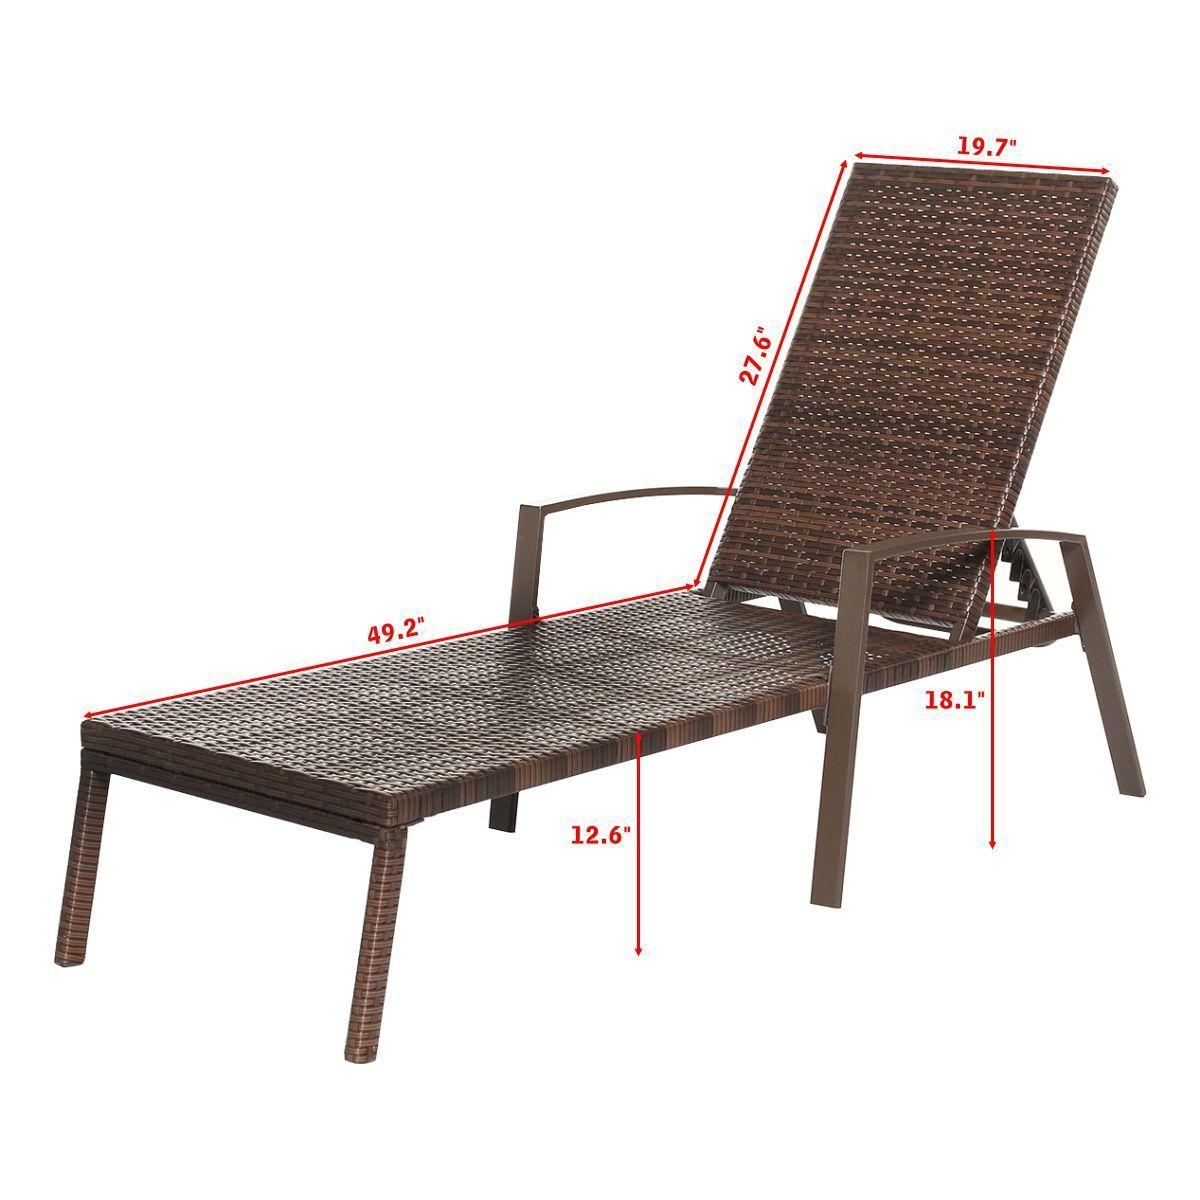 2pcs Patio Rattan Lounge Chair Garden Furniture Adjustable Back W/ Cushion - image 9 of 10